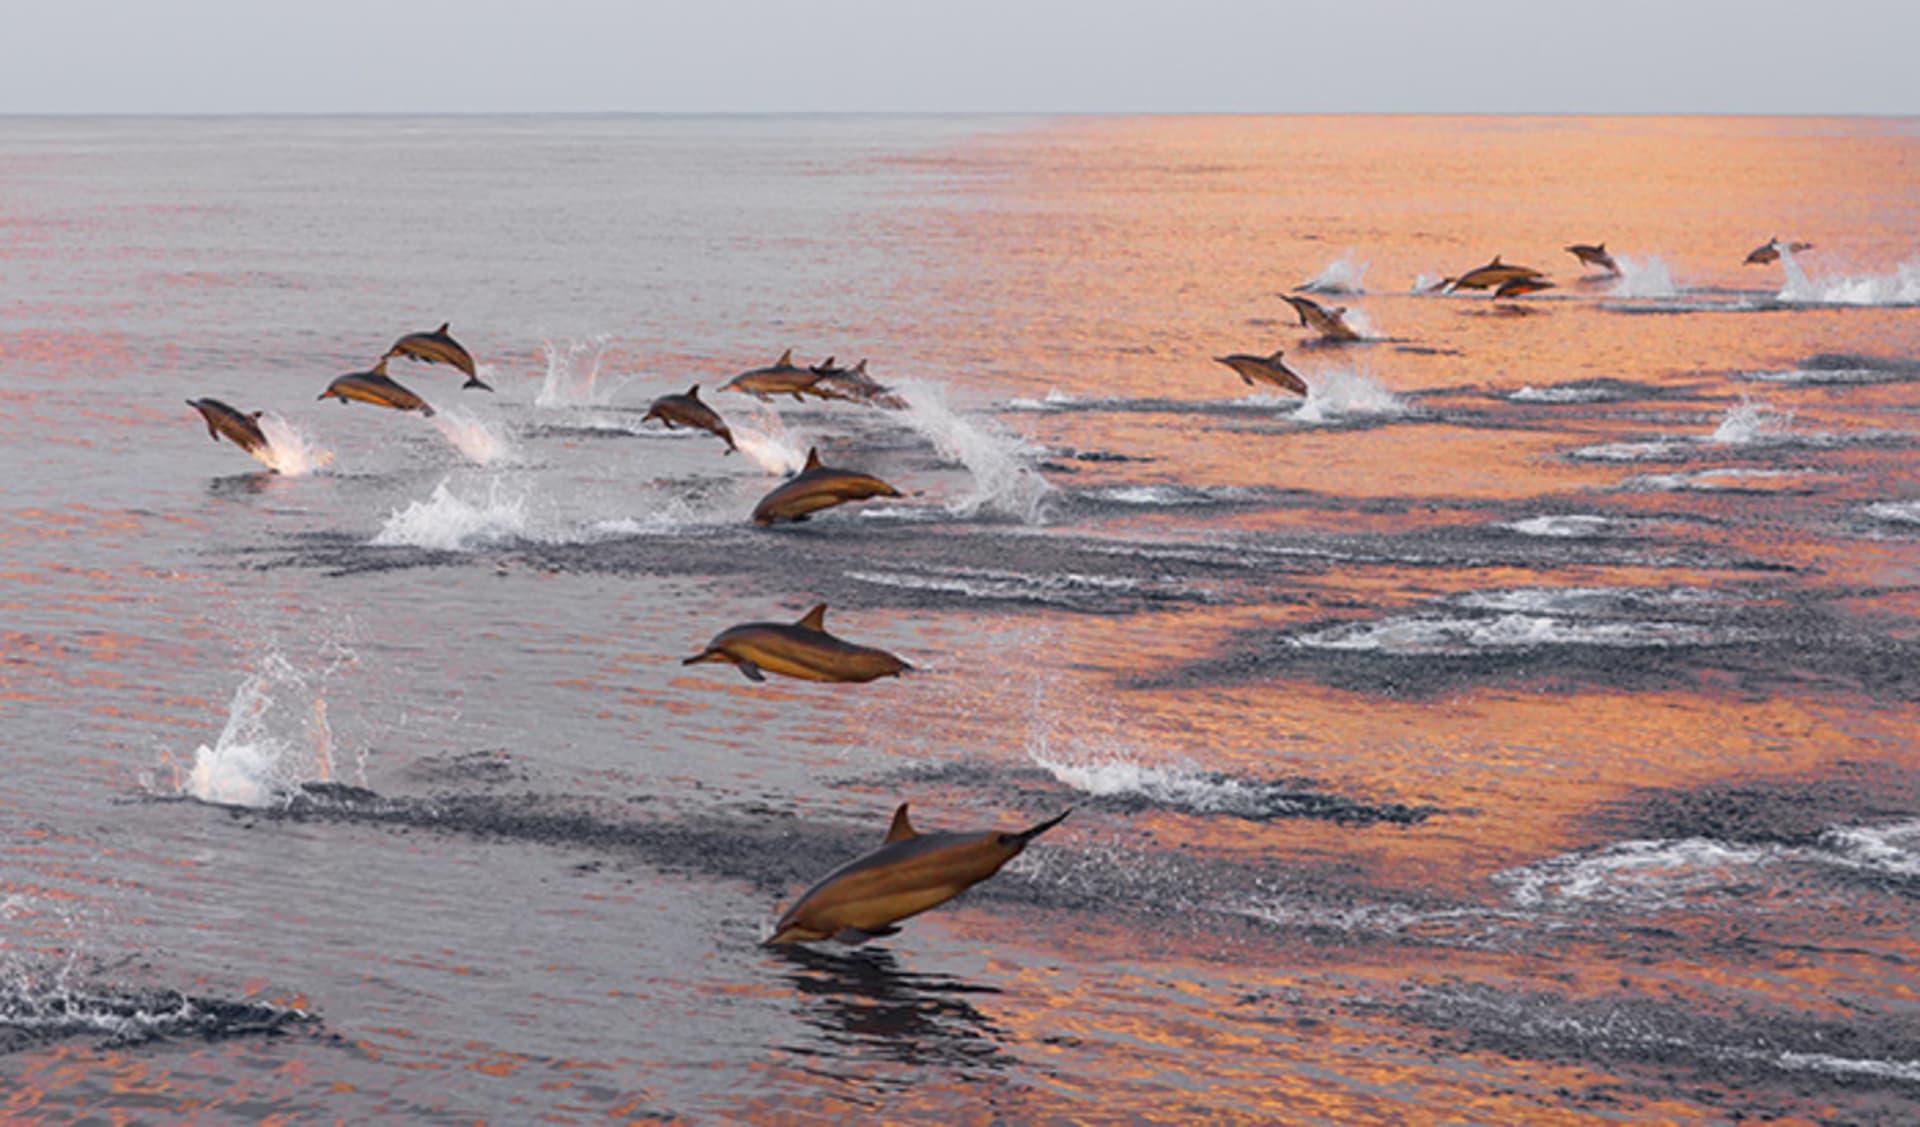 Sunset Cruise, Malediven